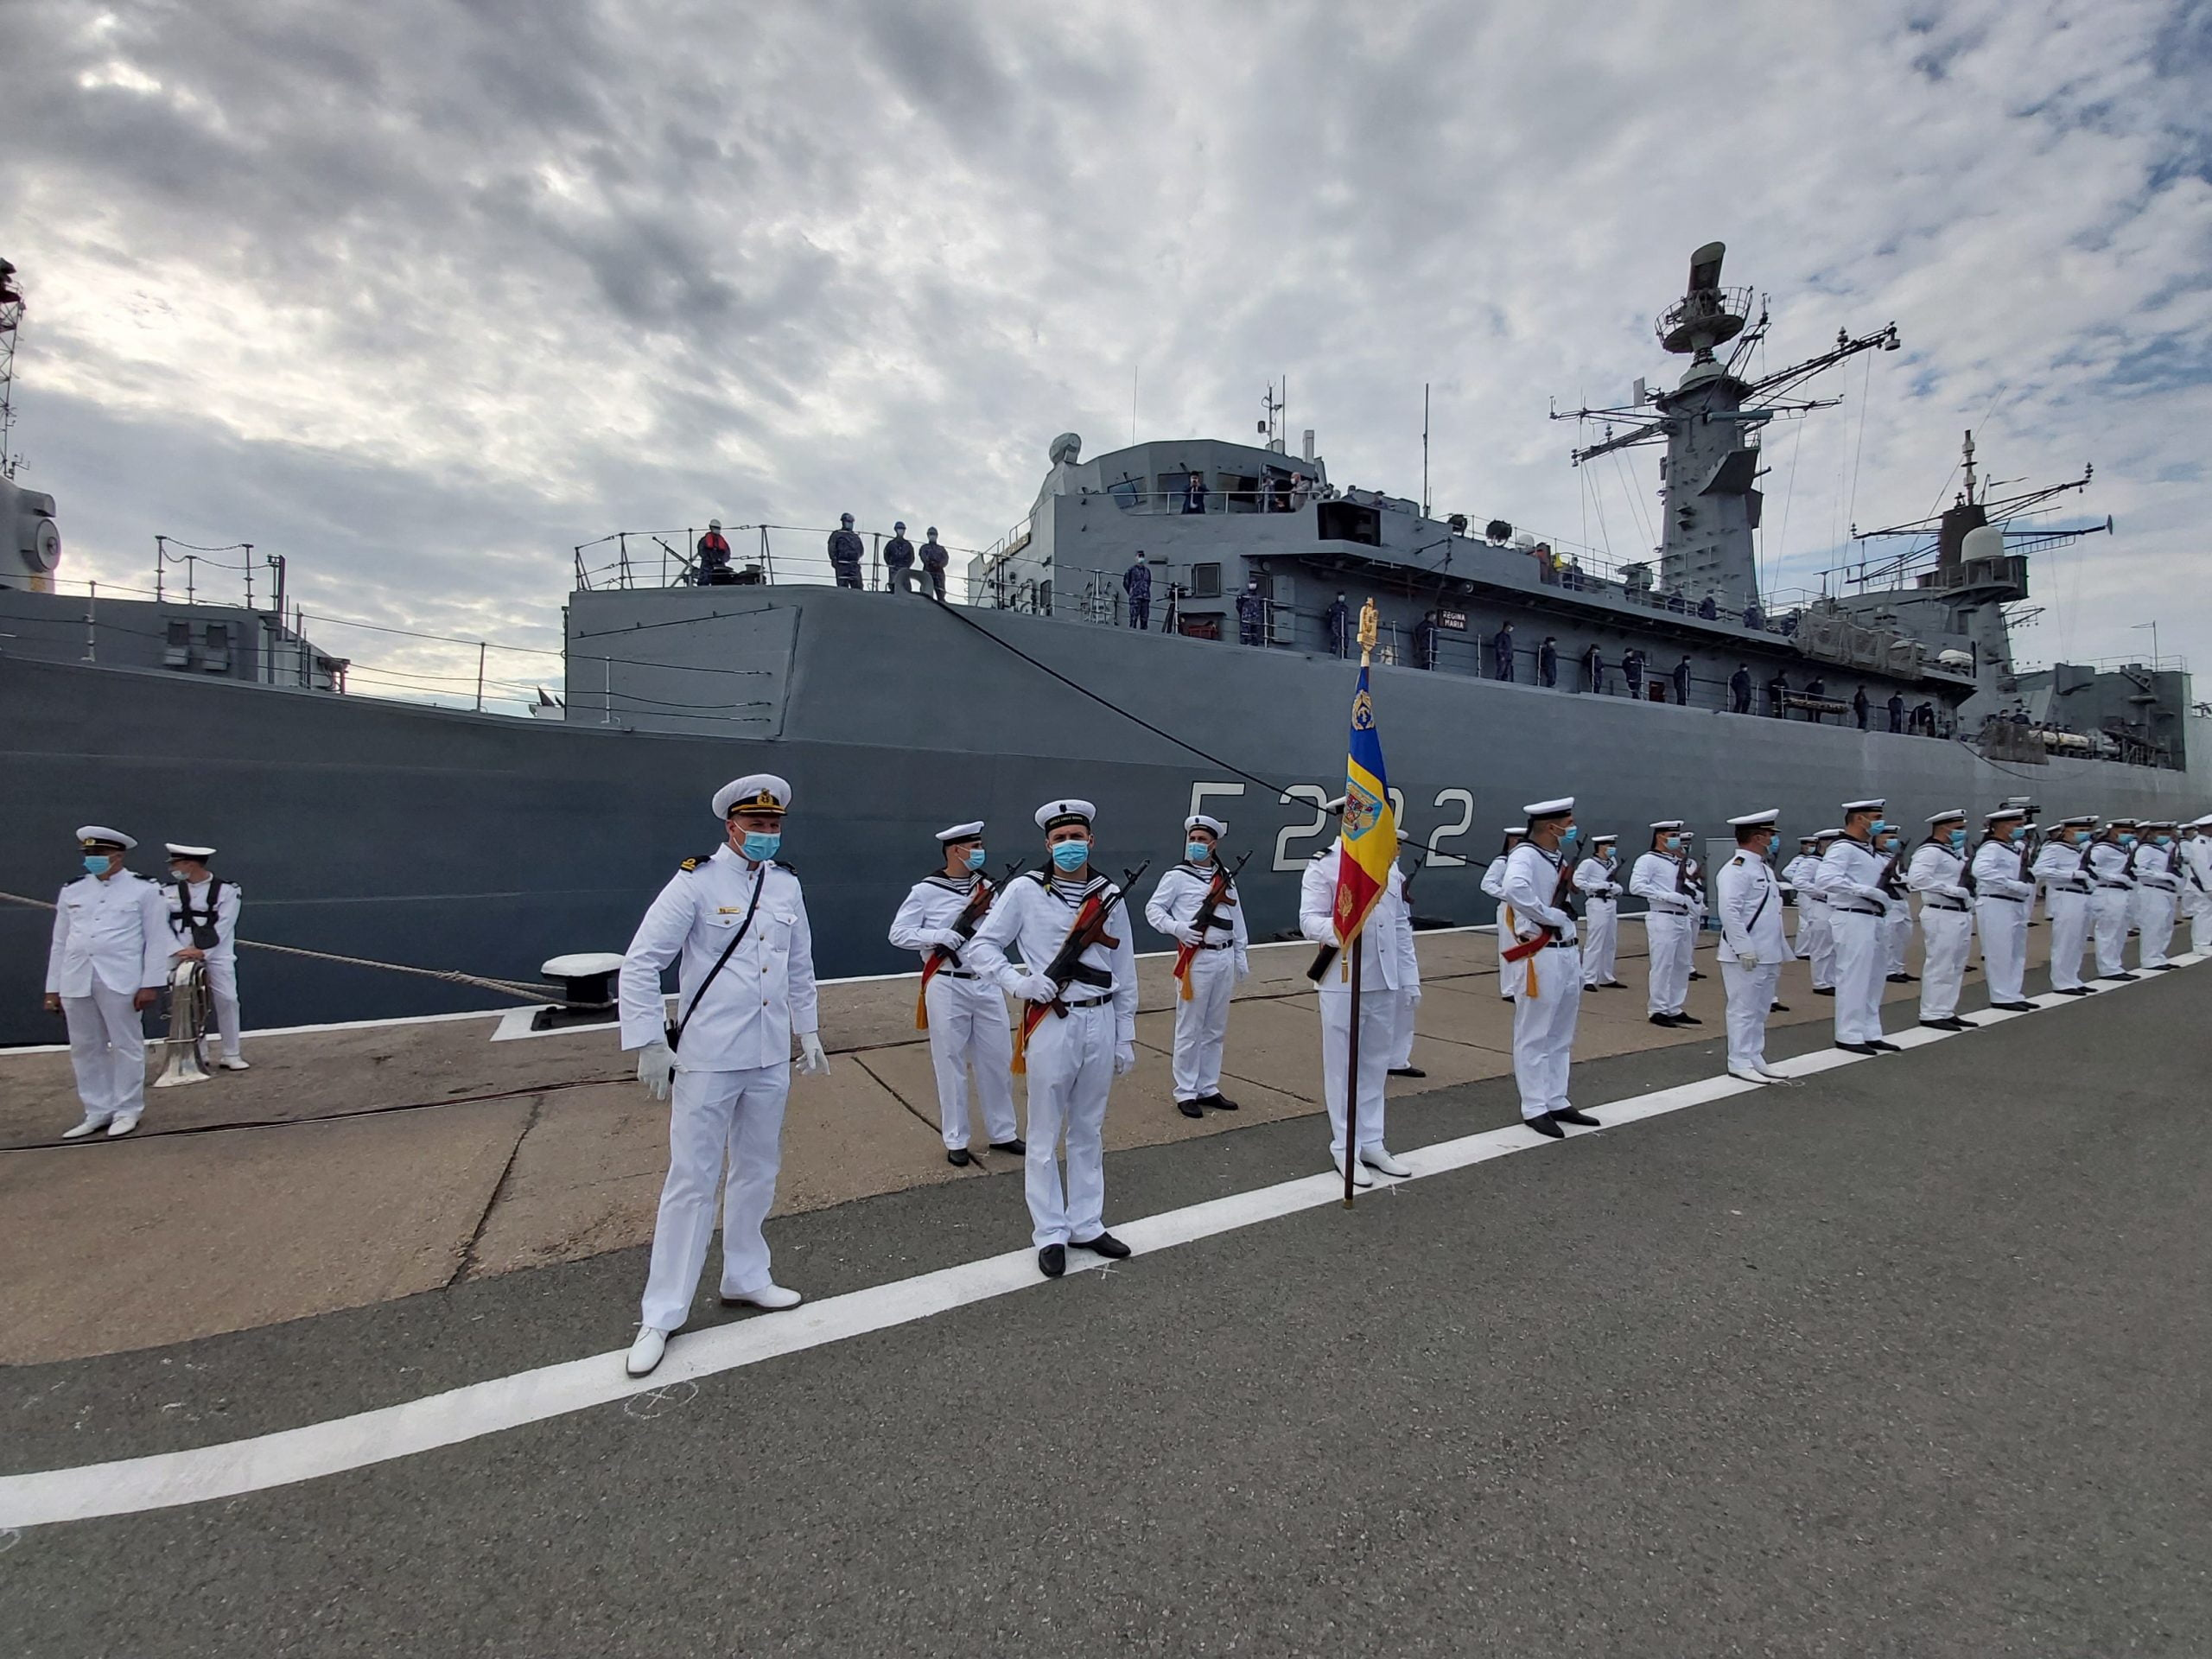 ziua marinei naval scaled